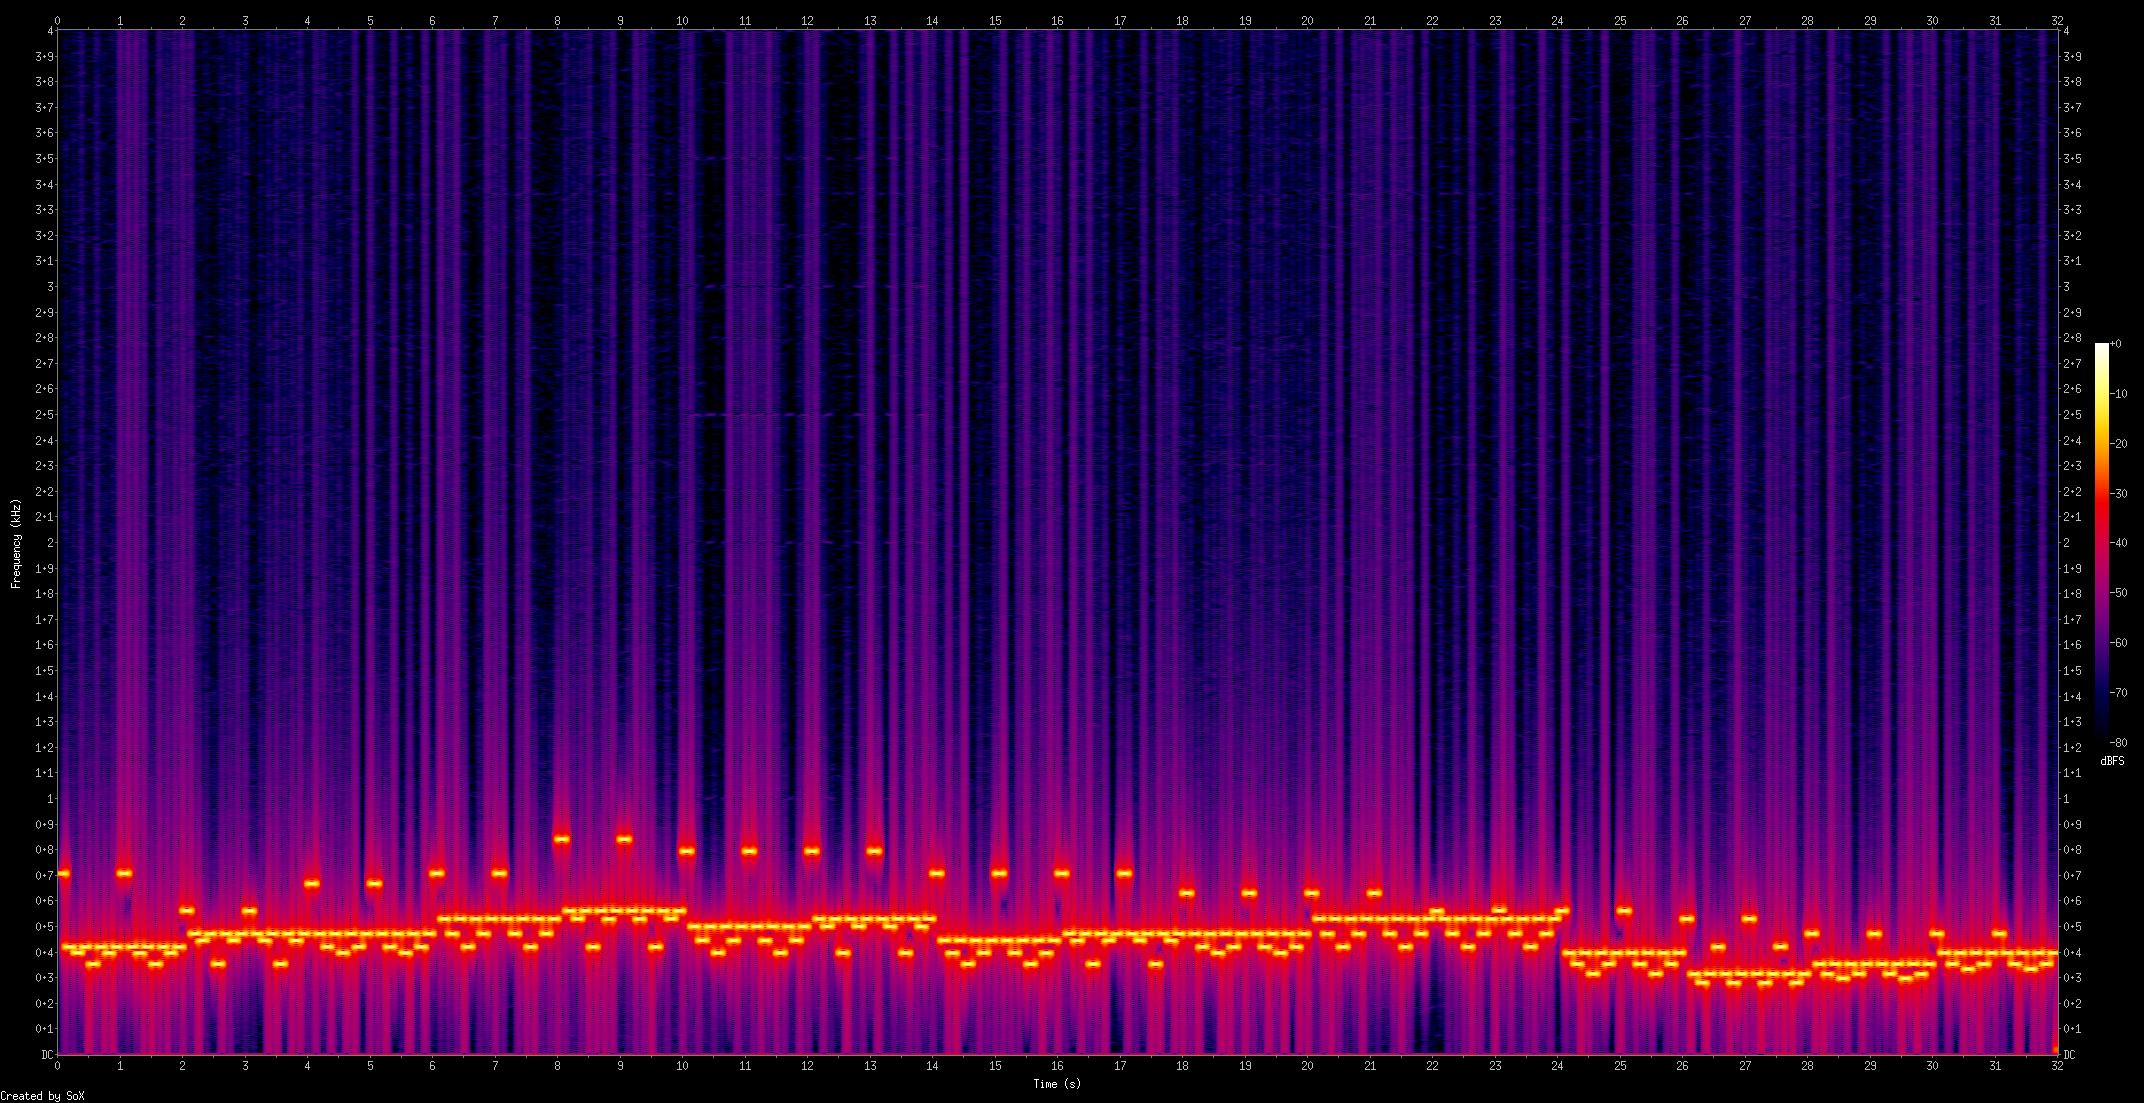 spectrogram_discontinuous